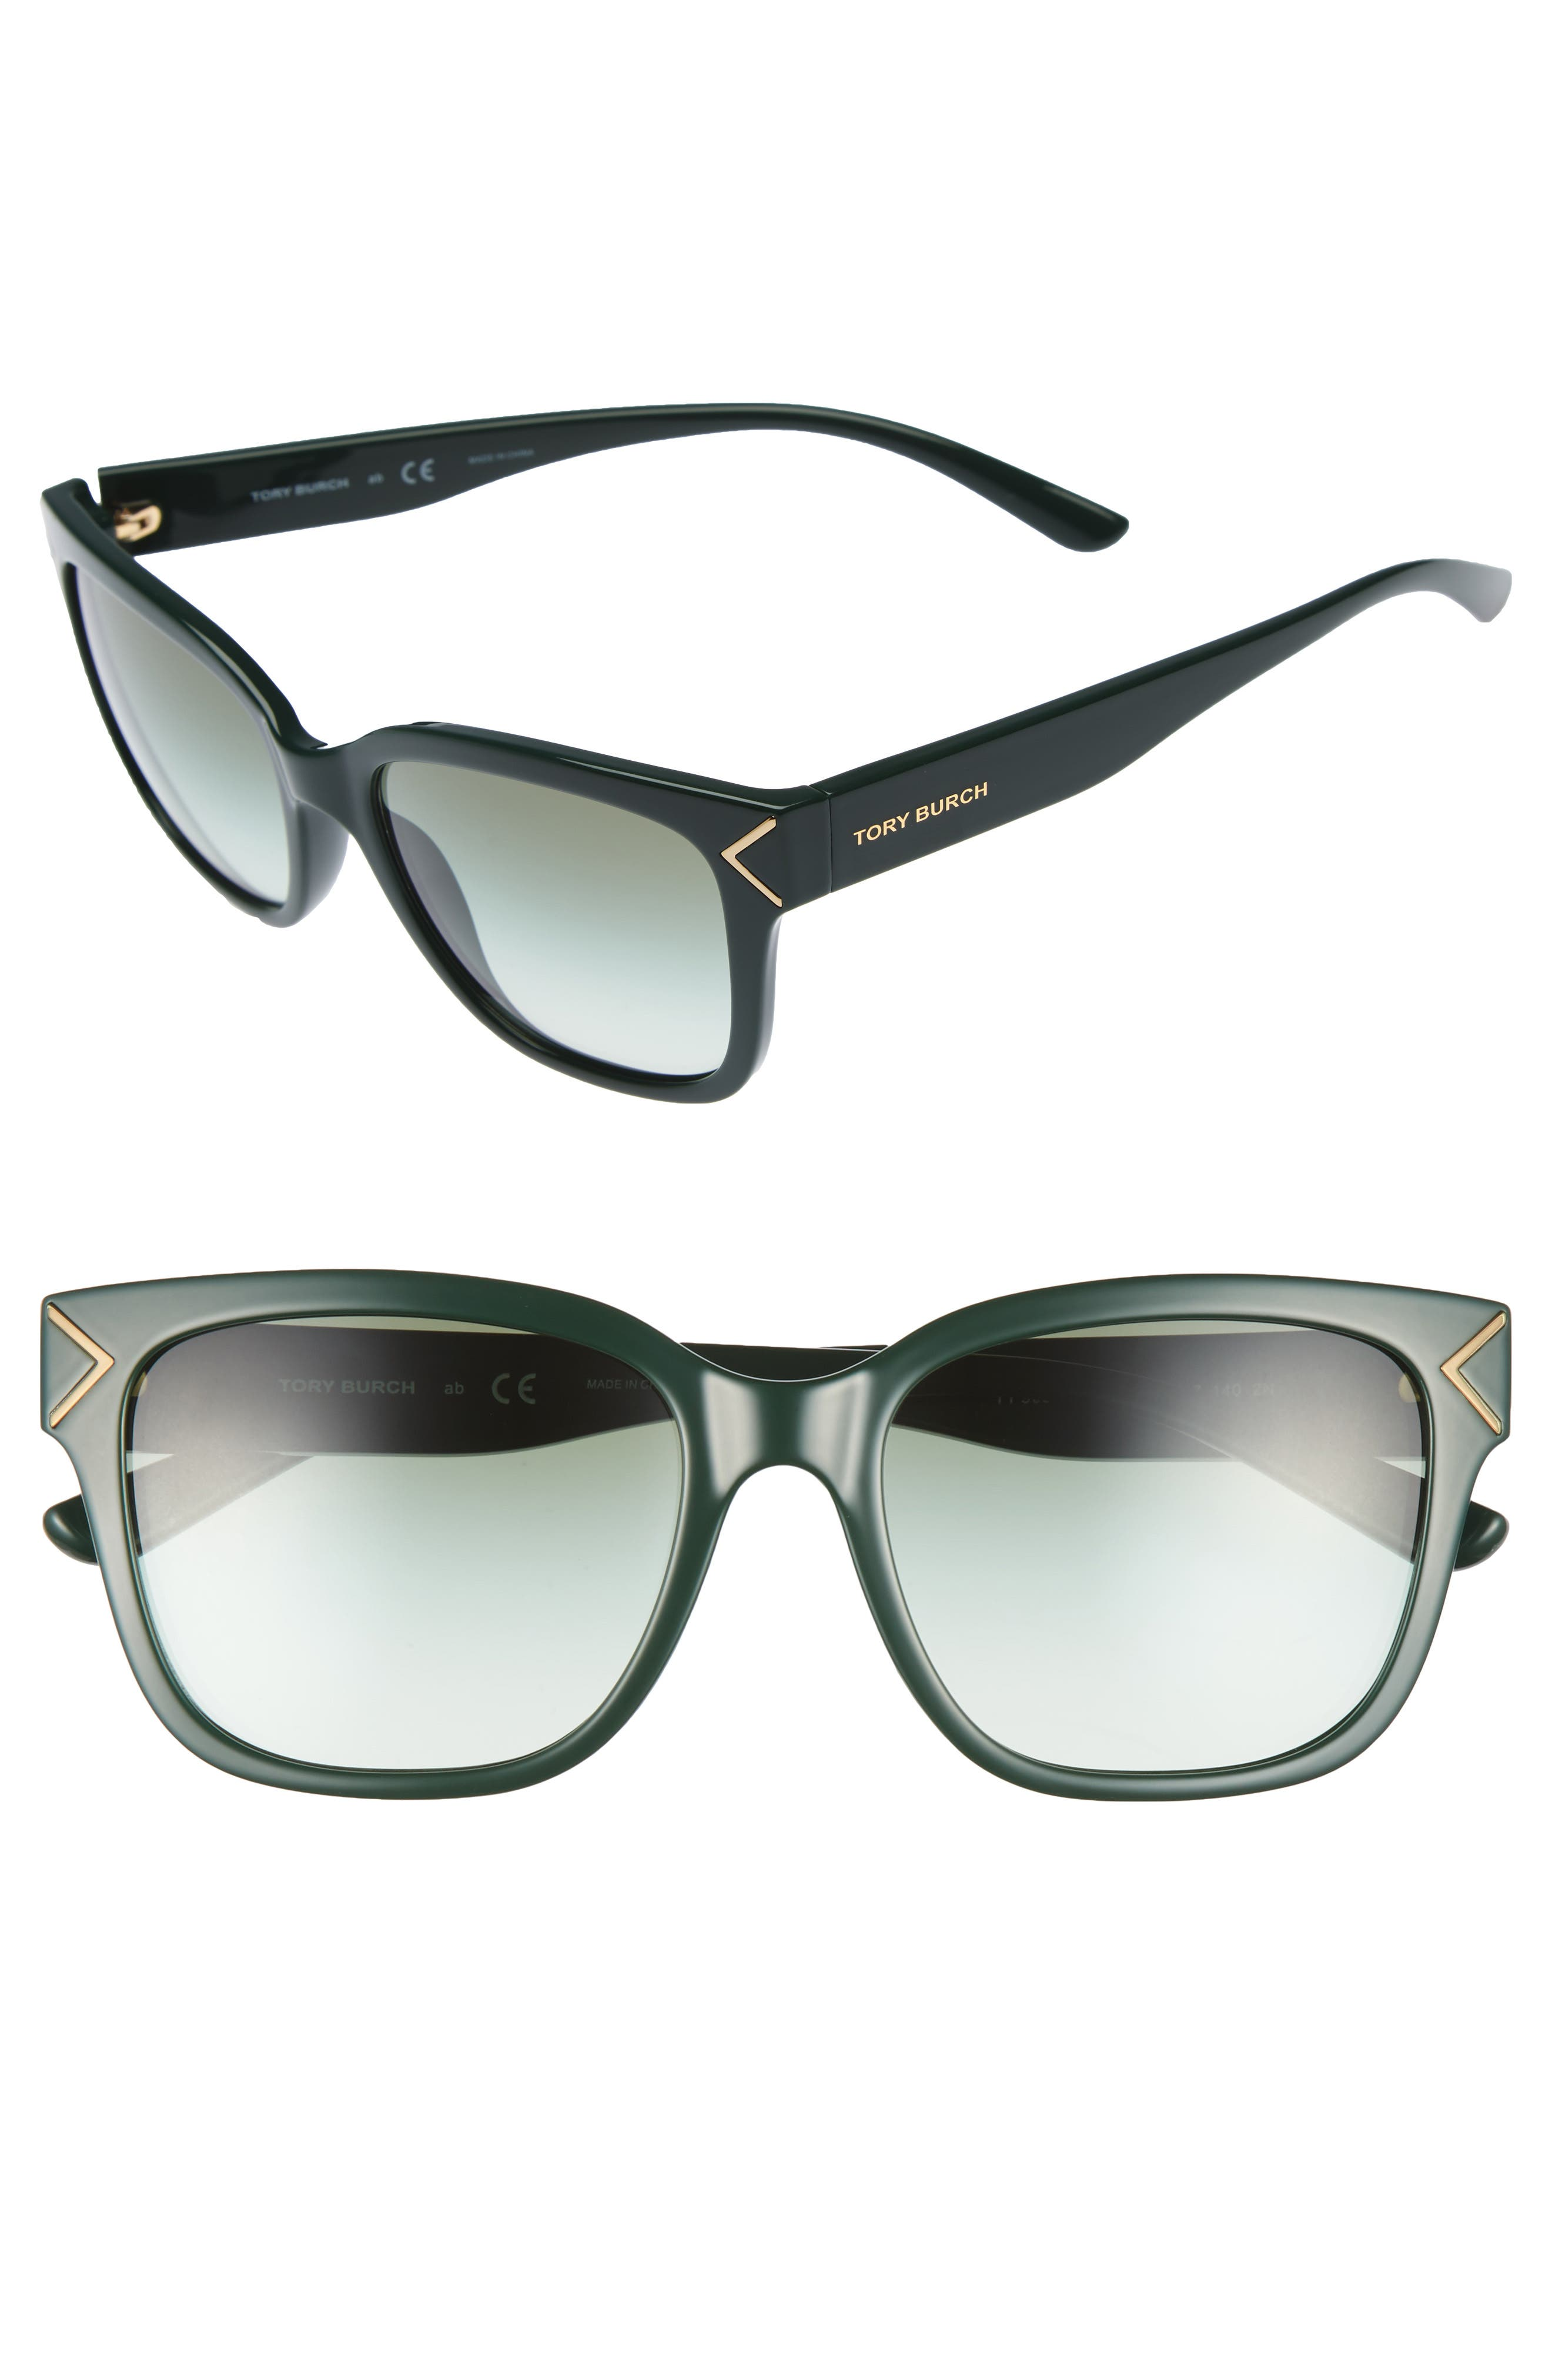 Main Image - Tory Burch 55mm Gradient Sunglasses